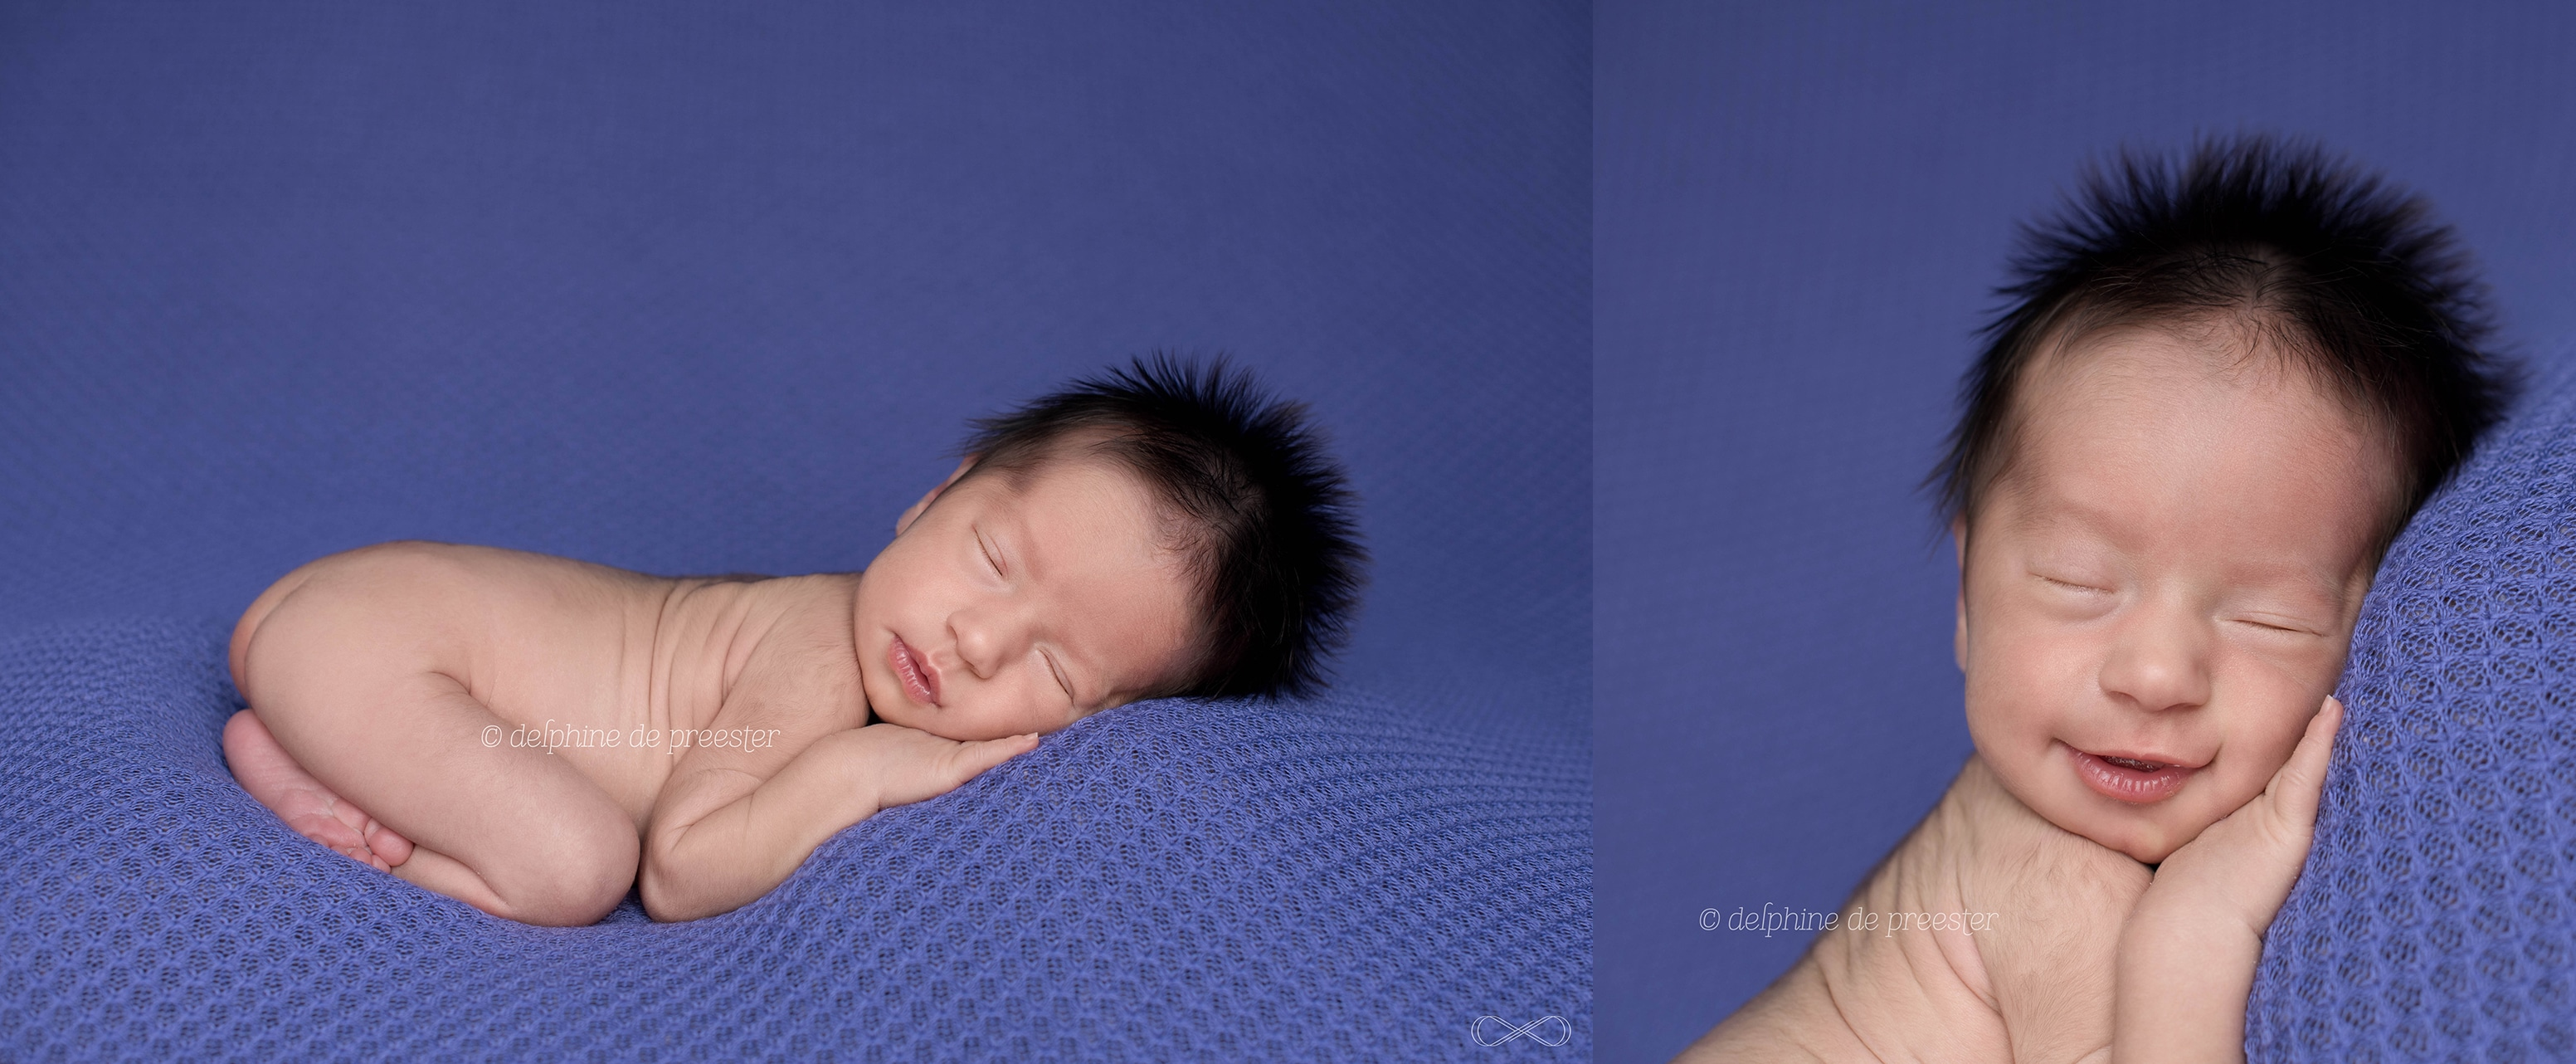 photographe bebe paris 91